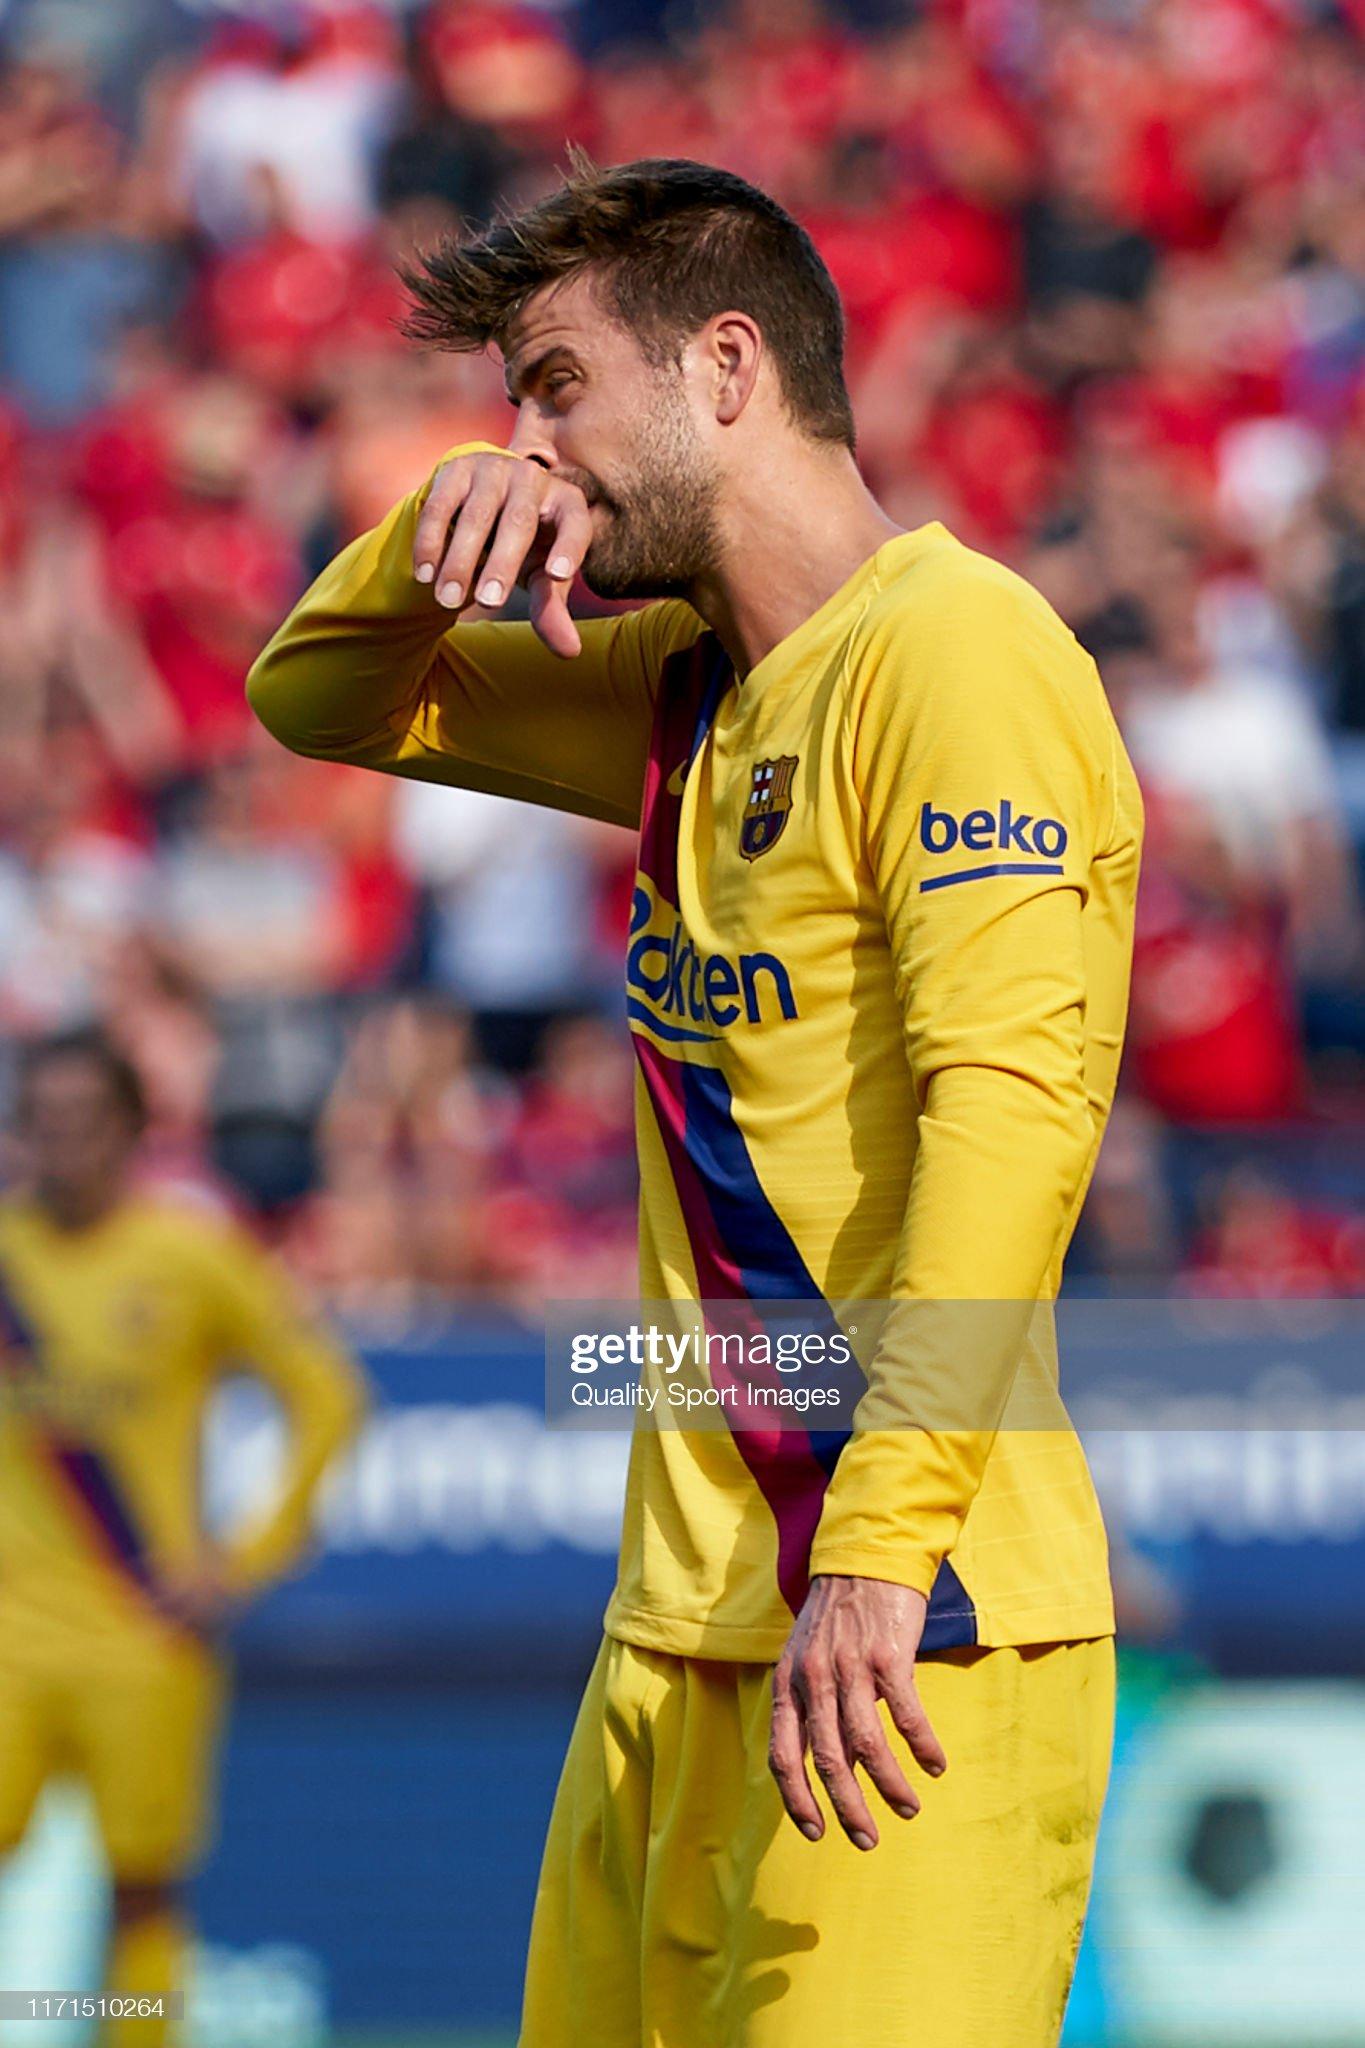 صور مباراة : أوساسونا - برشلونة 2-2 ( 31-08-2019 )  Gerard-pique-of-fc-barcelona-reacts-during-the-liga-match-between-ca-picture-id1171510264?s=2048x2048